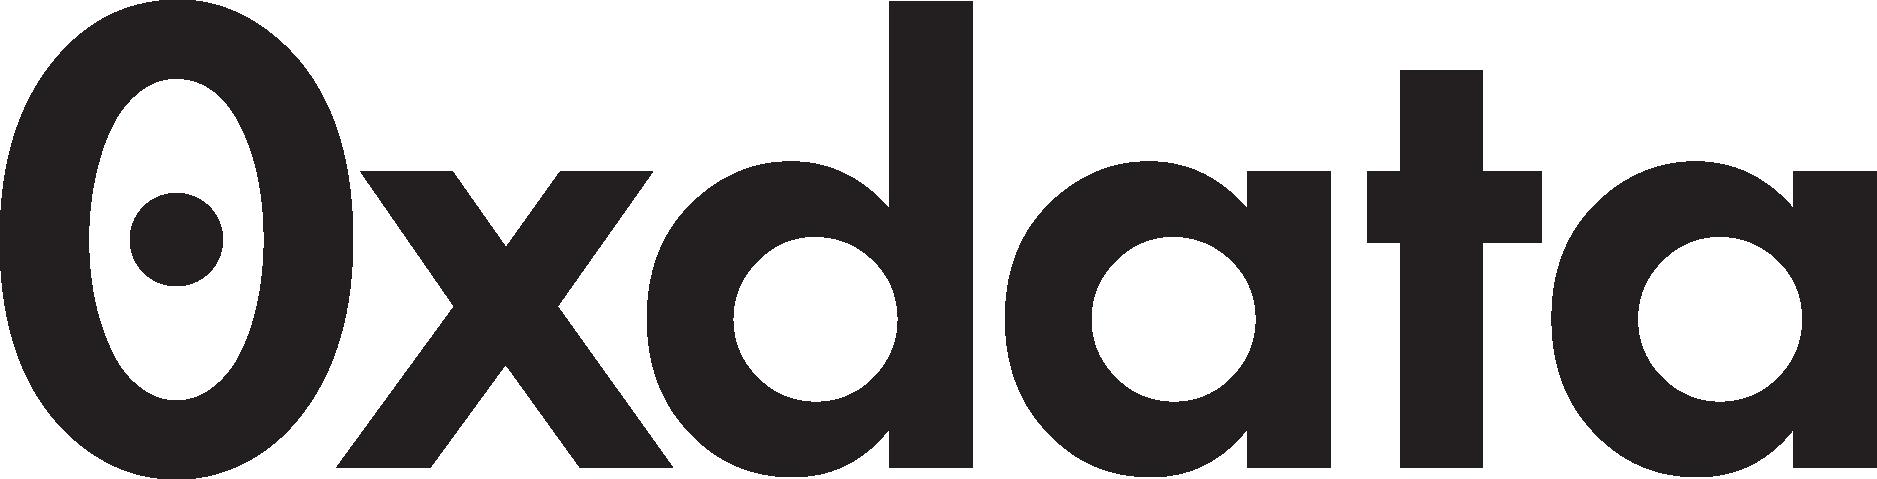 0xdata-final-black